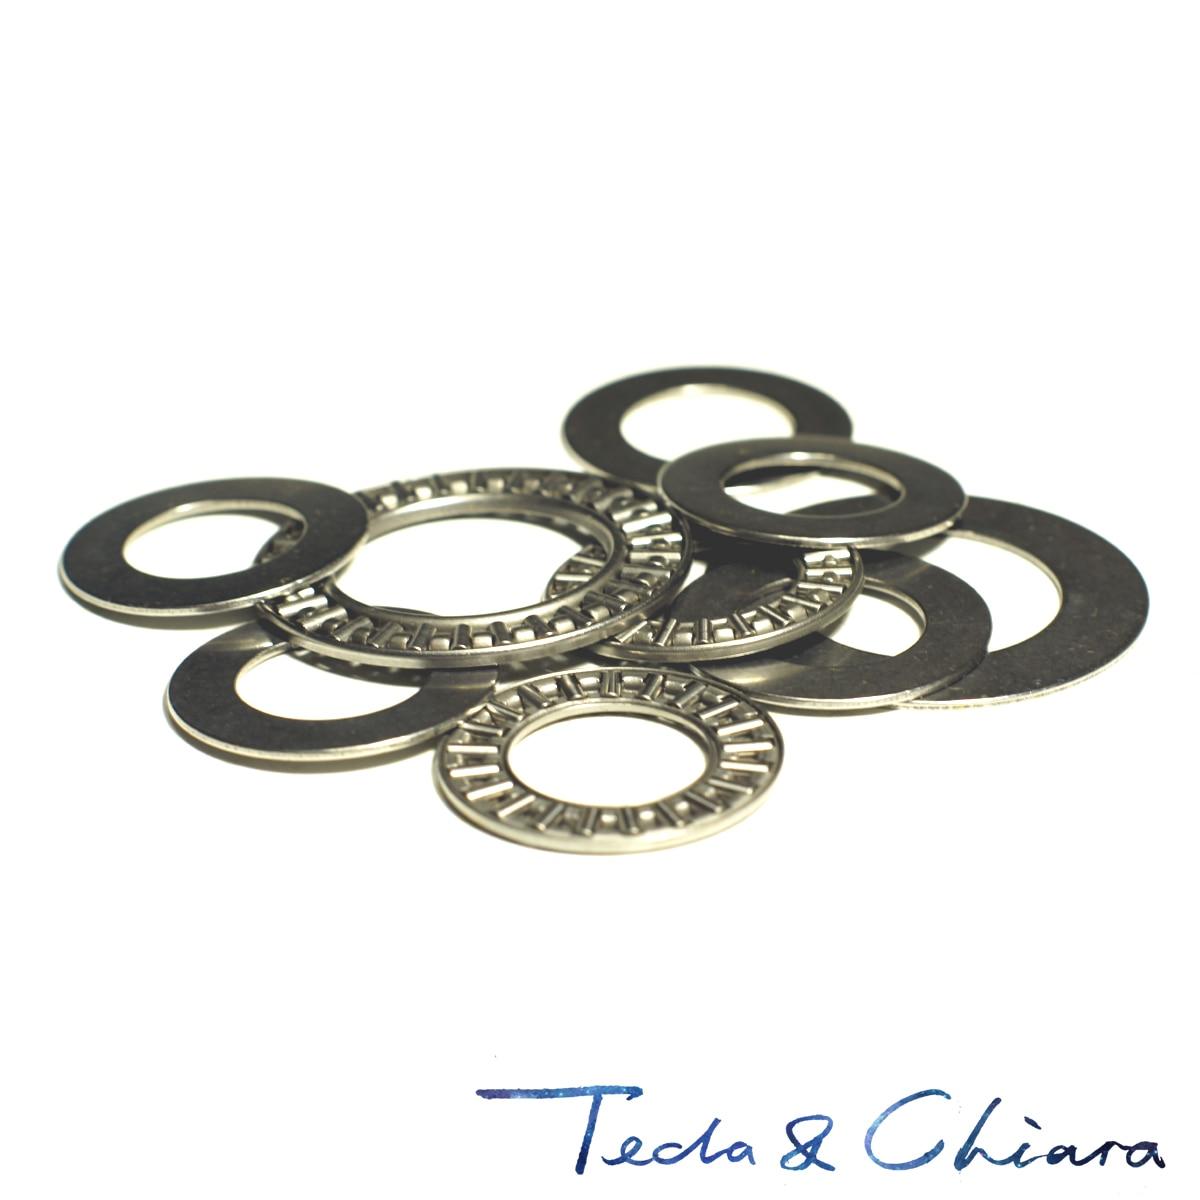 1Pc / 1Piece AXK2035 20 X 35 X 4 Mm & 2AS Thrust Needle Roller Bearing Washers High Quality * AXK